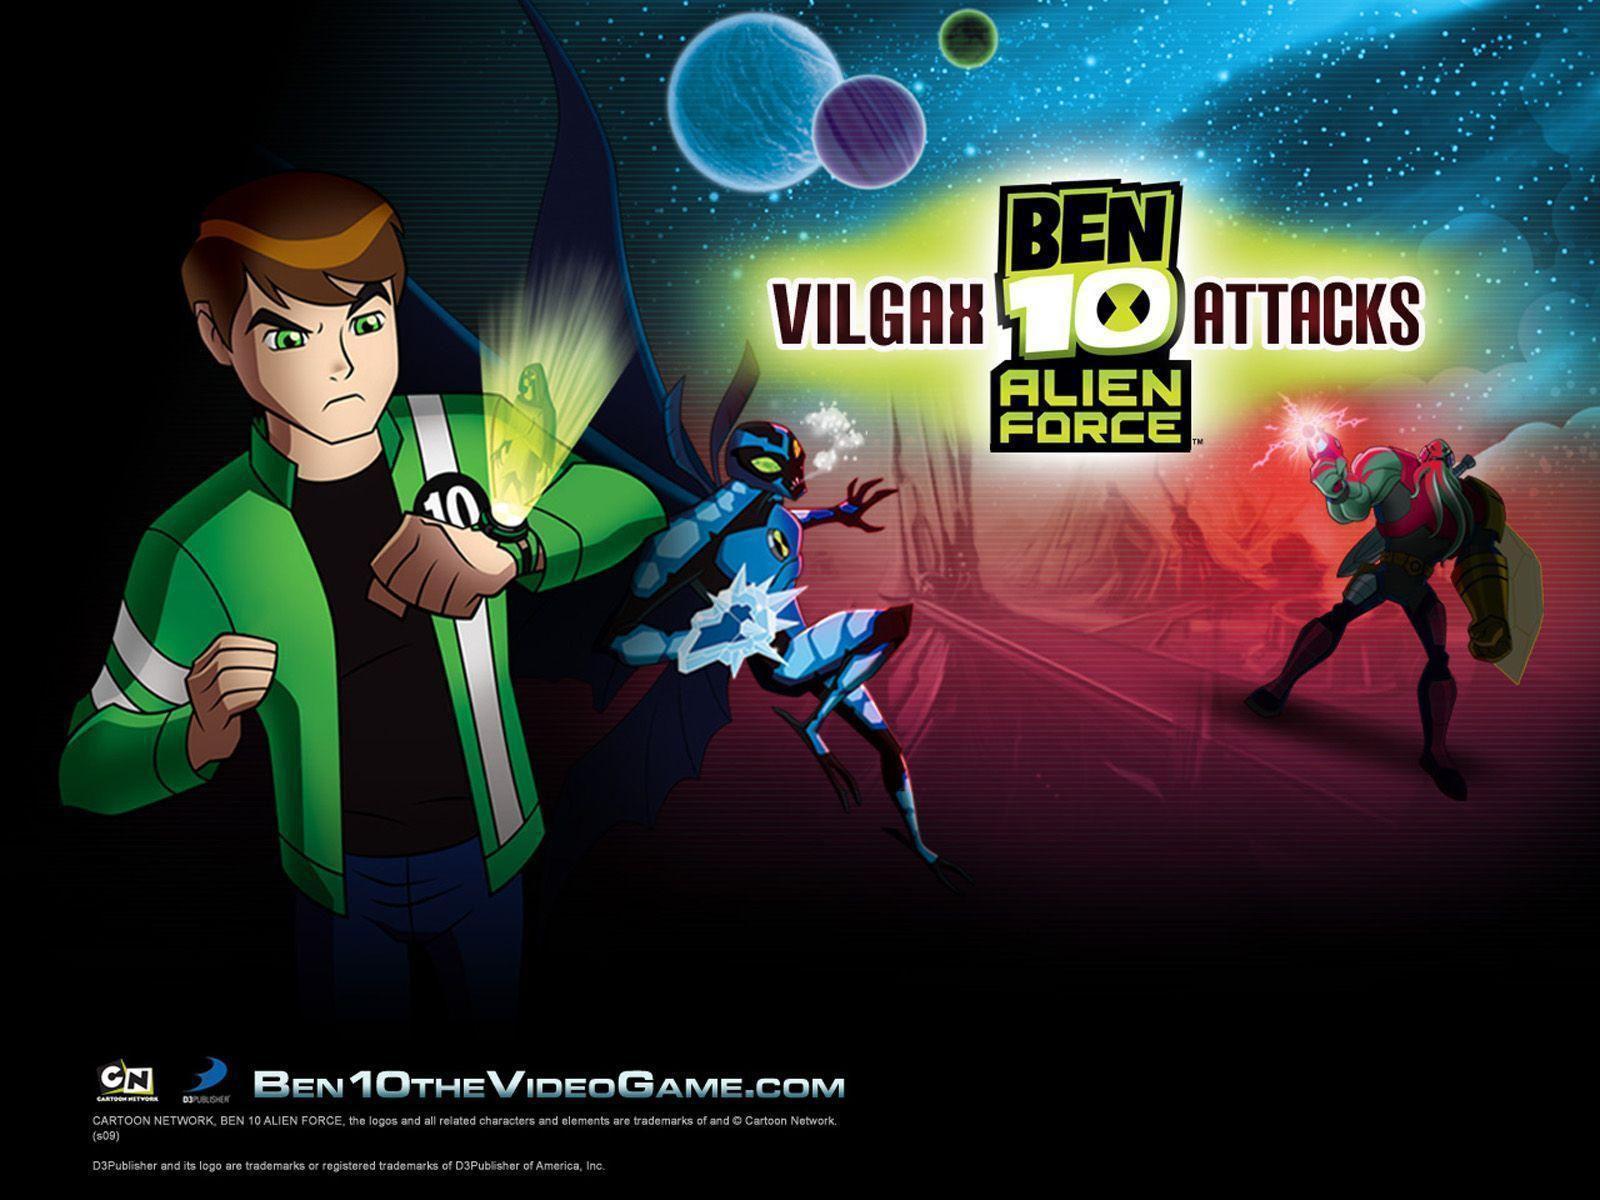 ben 10 alien force season 1 all episodes in hindi download